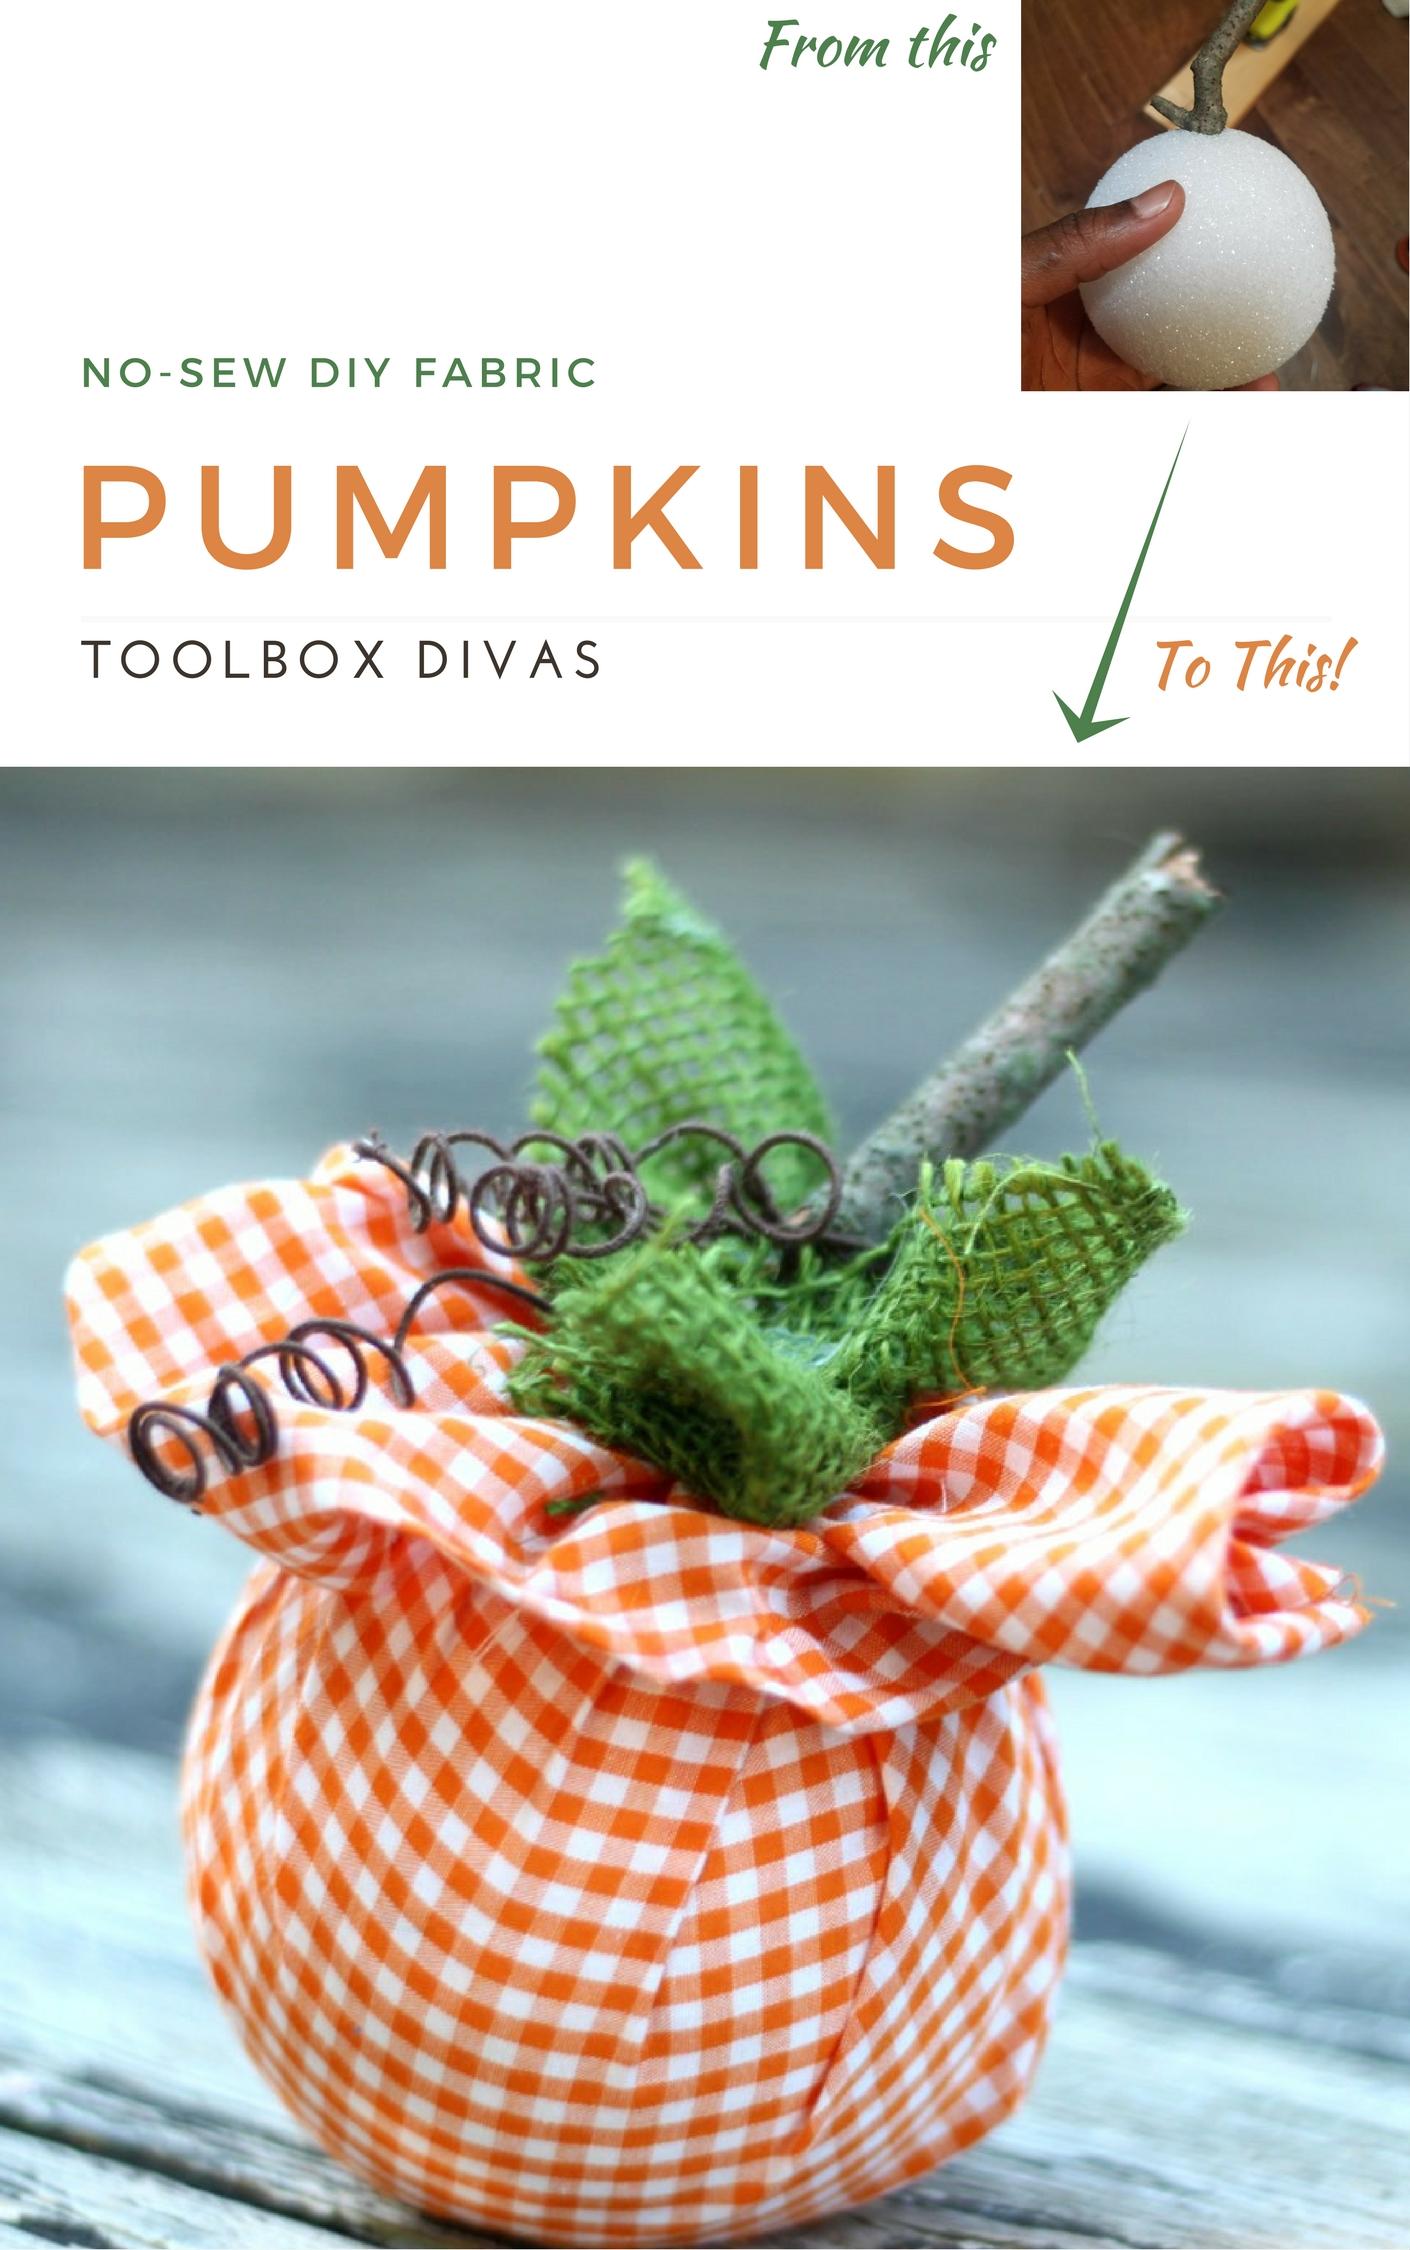 DIY No Sew Pumpkin Hack. Quick easy weekend craft project #Fall #Nosew #Pumpkins #ToolboxDivas